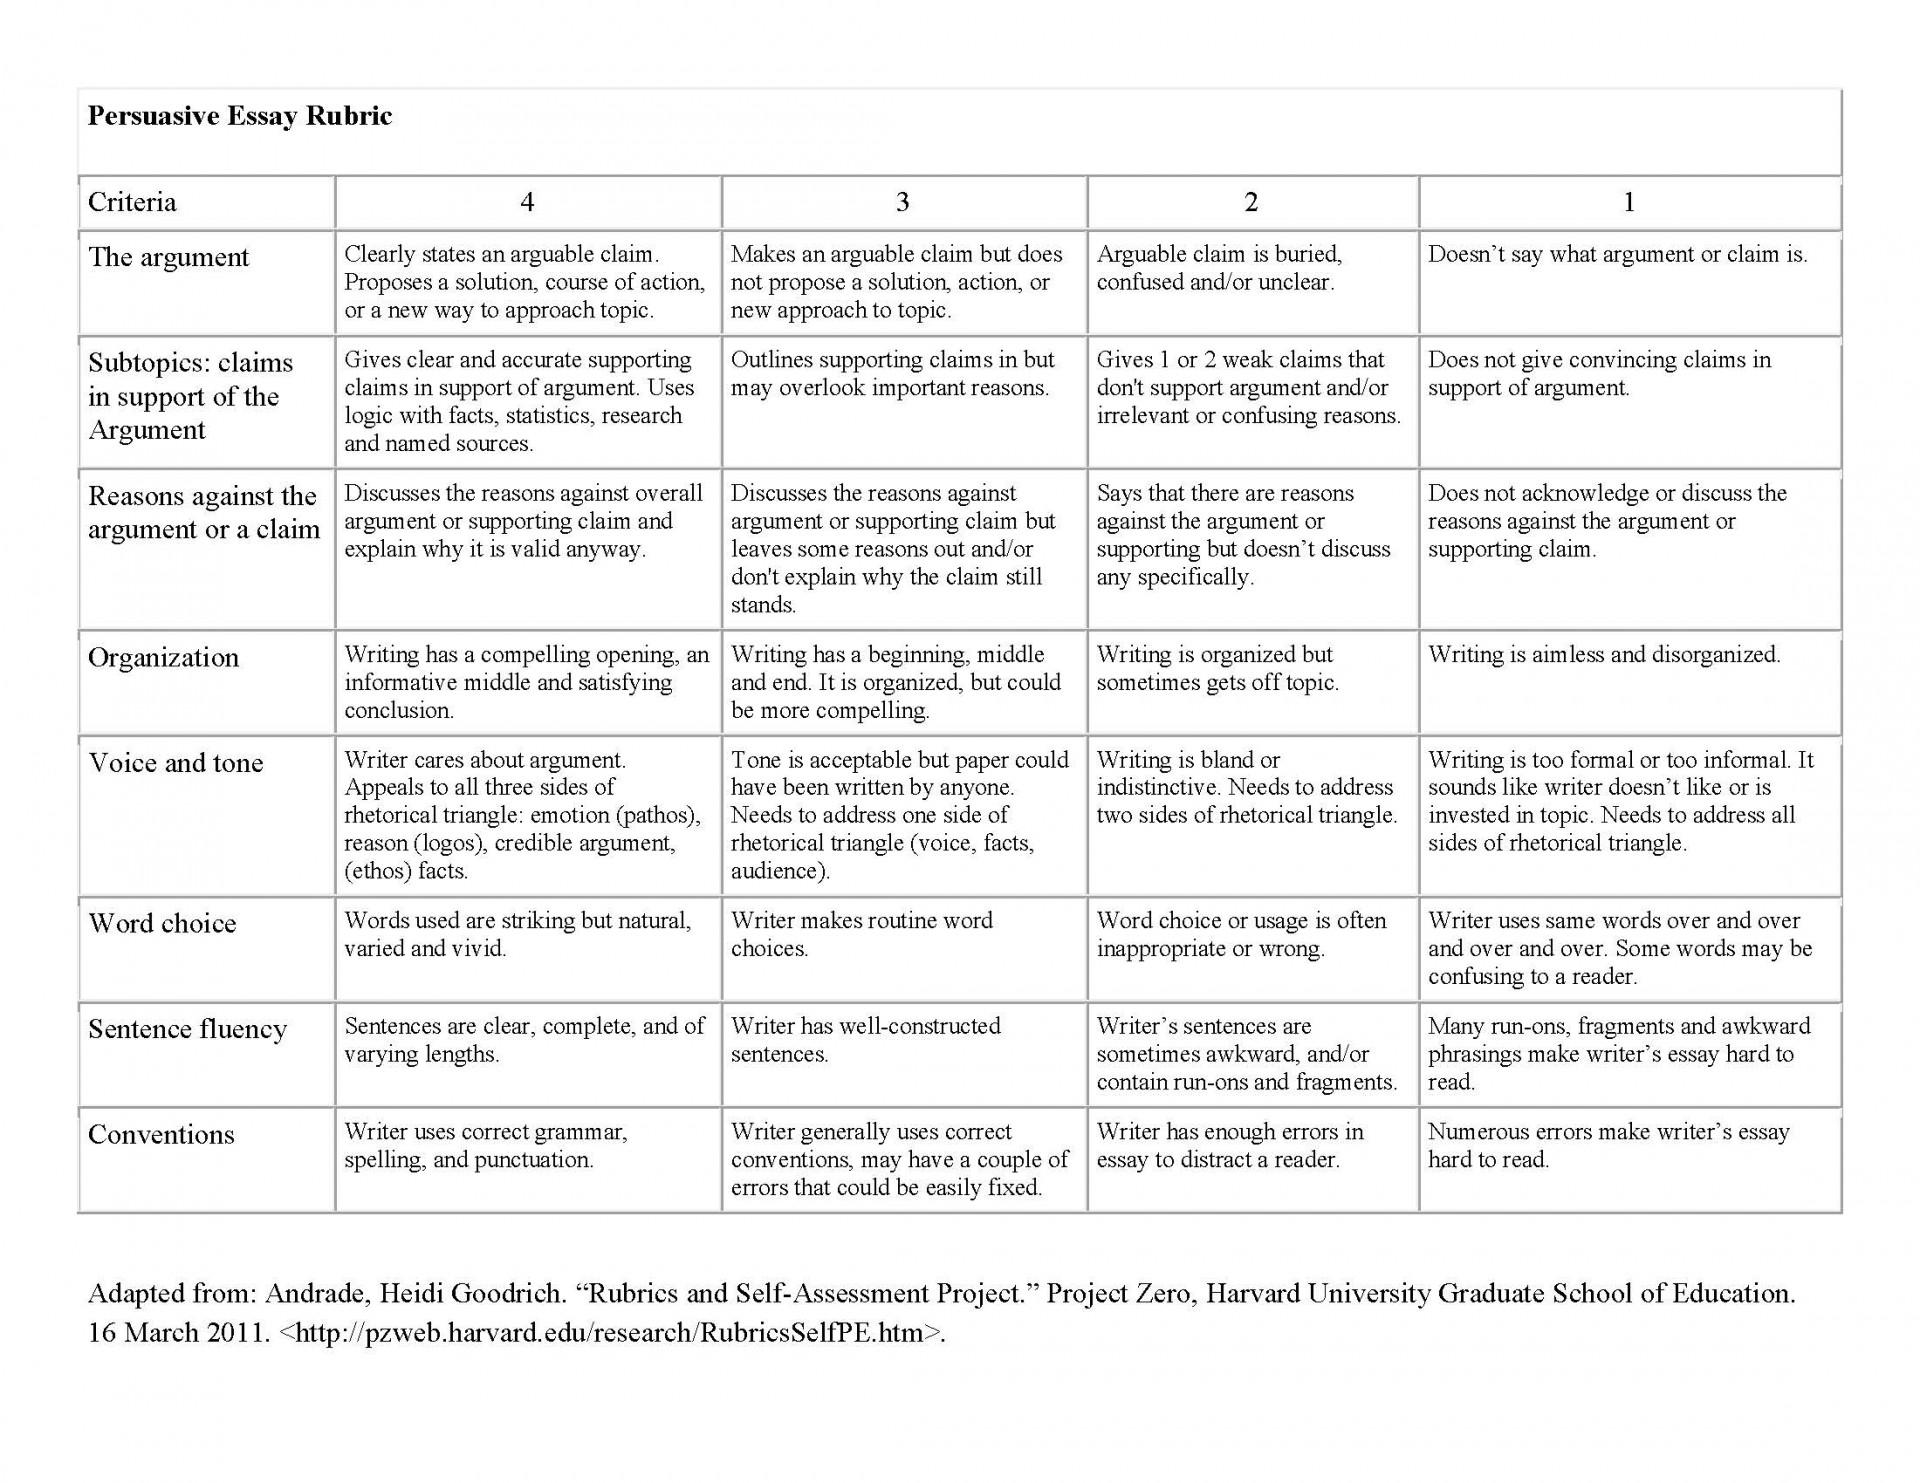 004 Handout Persuasive Essaycbu003d Example Stunning Essay Rubric Argumentative Grade 10 8th Doc Middle School Pdf 1920